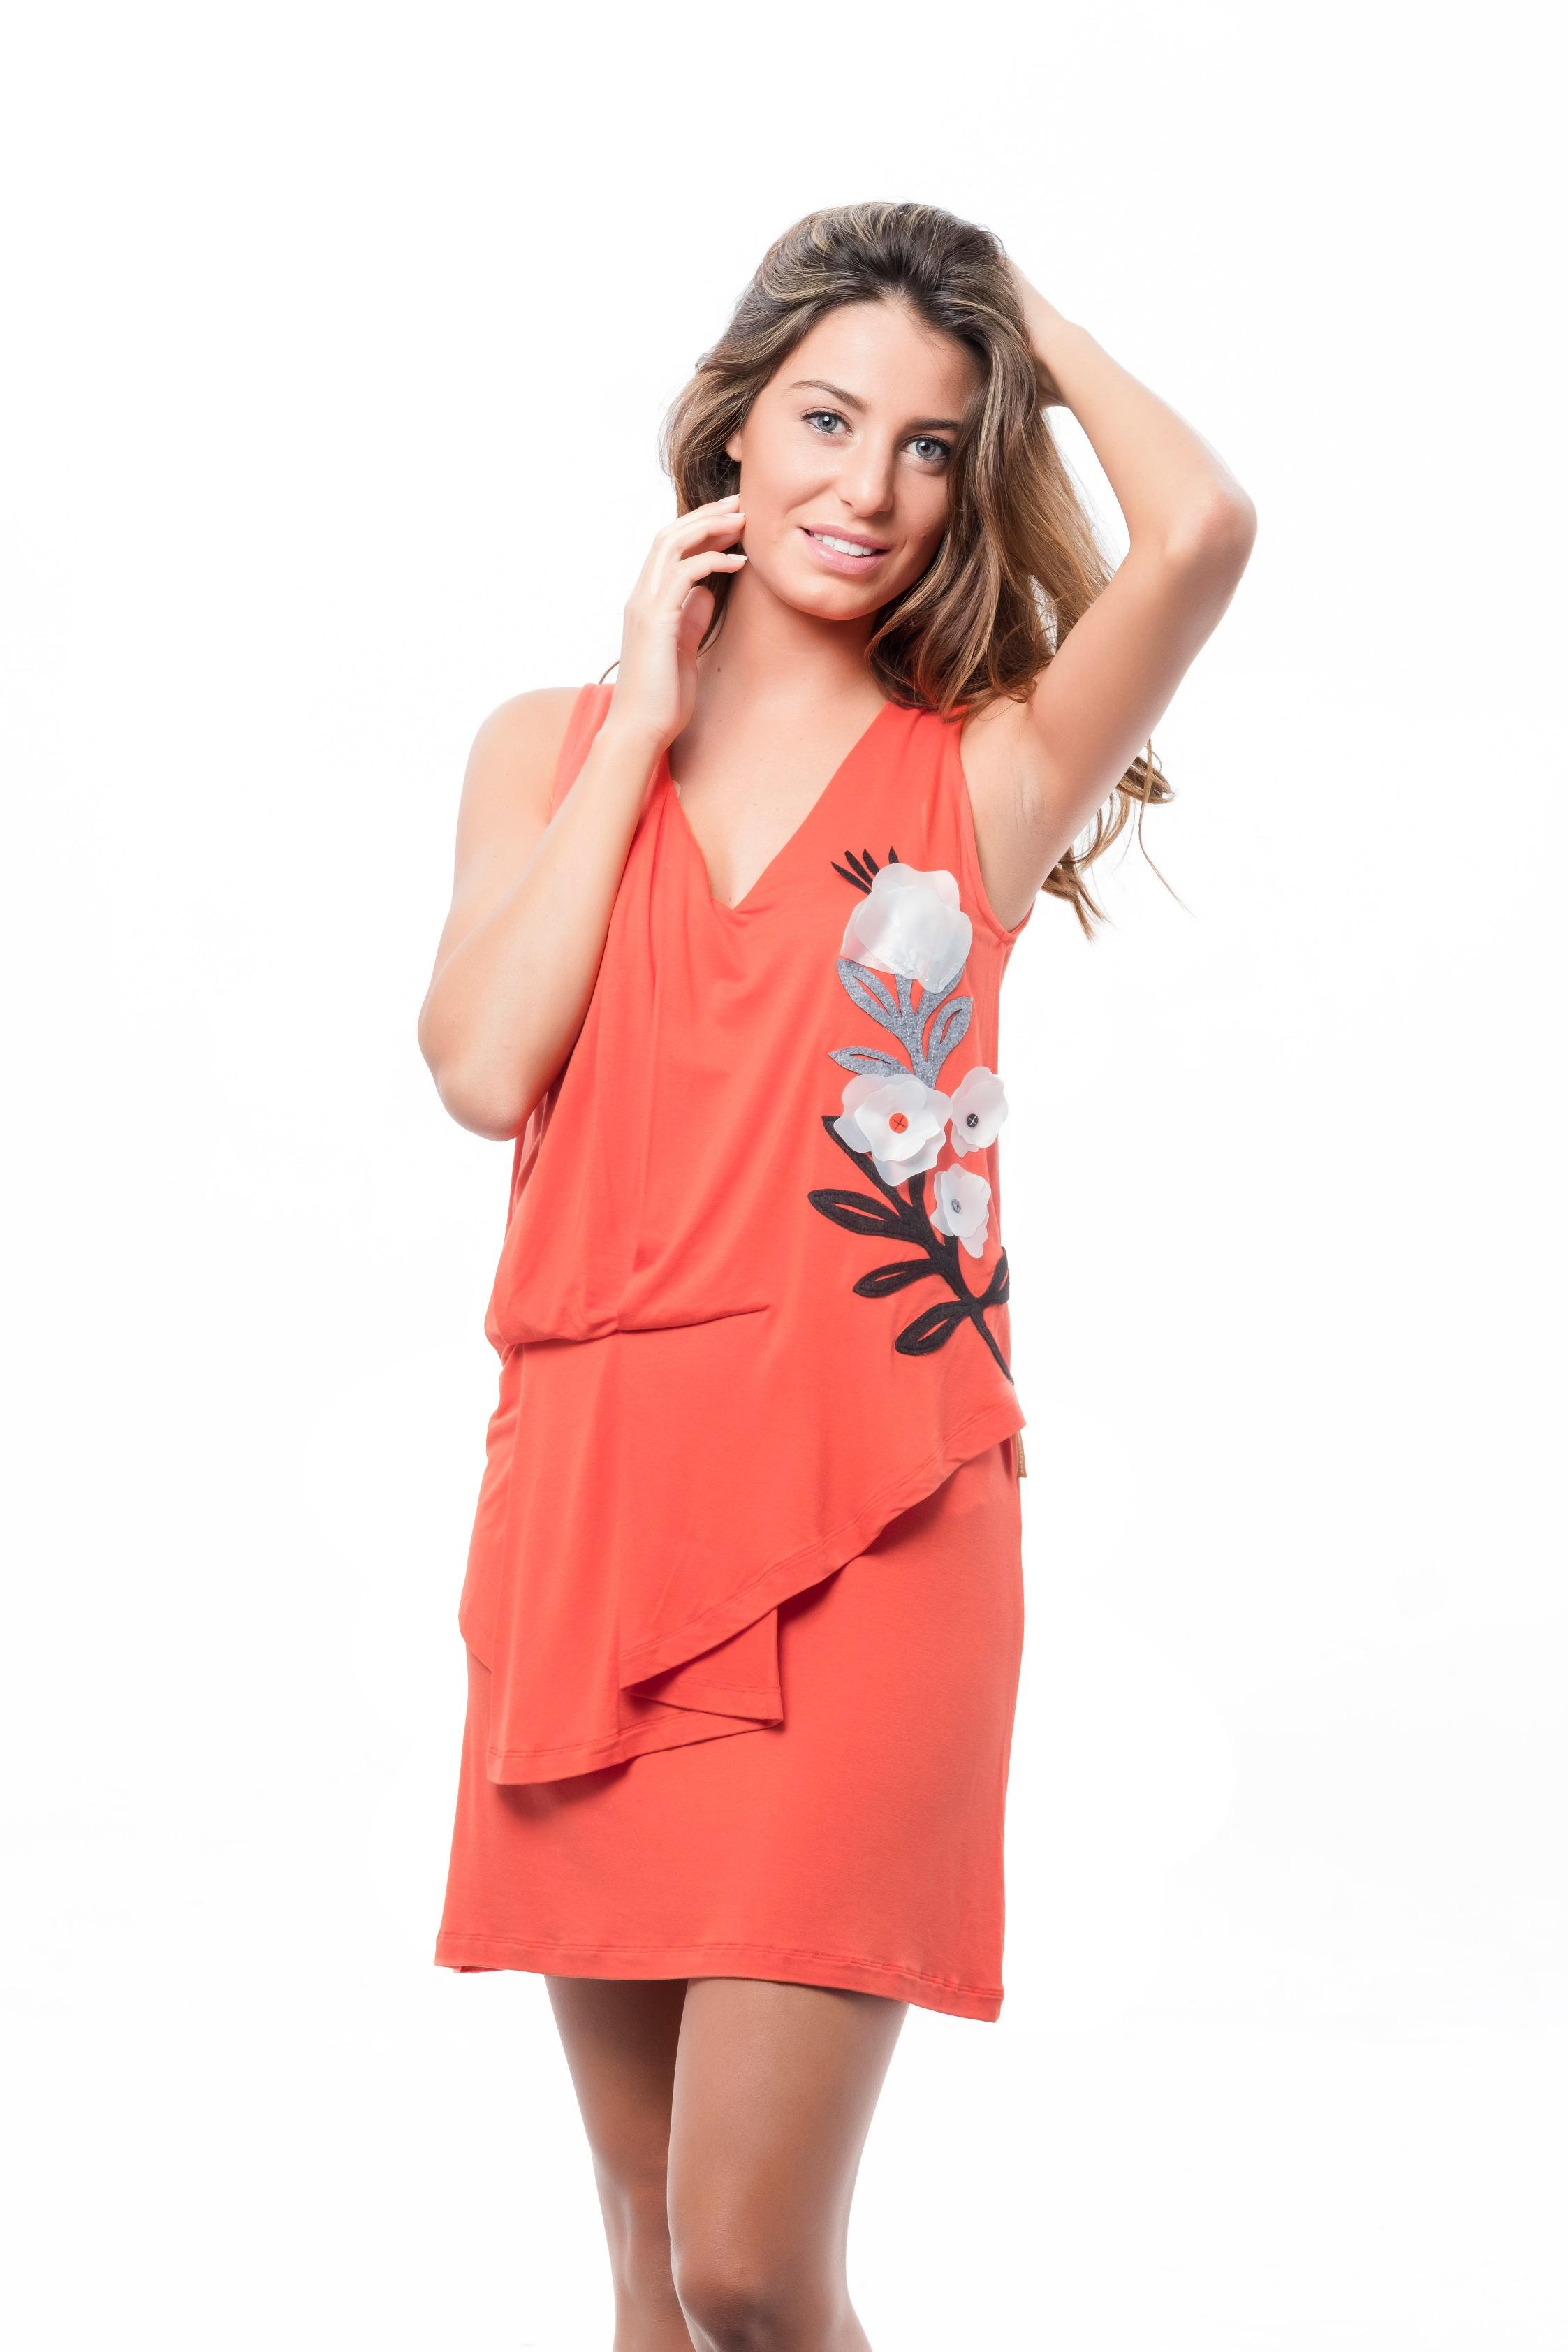 Mamatayoe Granada Dámské šaty oranžová. 1 574 Kč 2 249 Kč bbefdc71bb